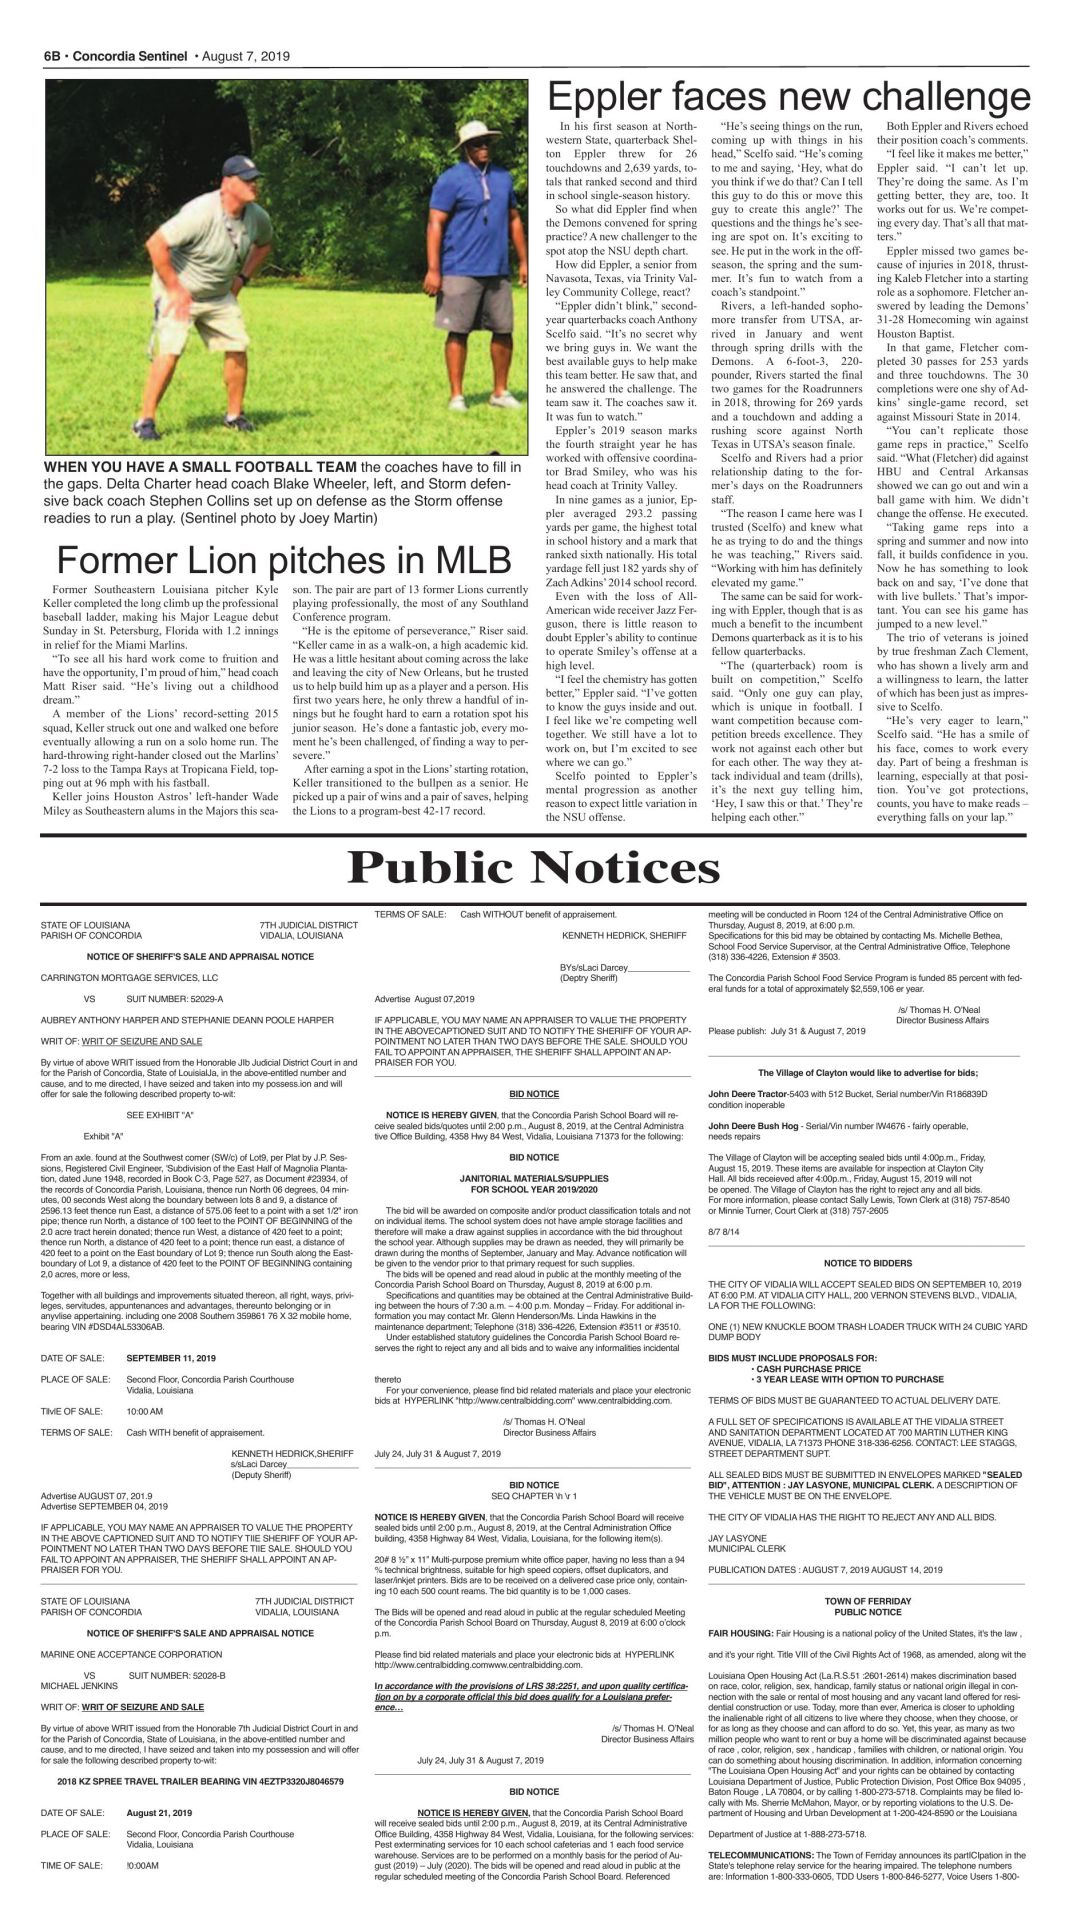 Public Notices - August 7, 2019